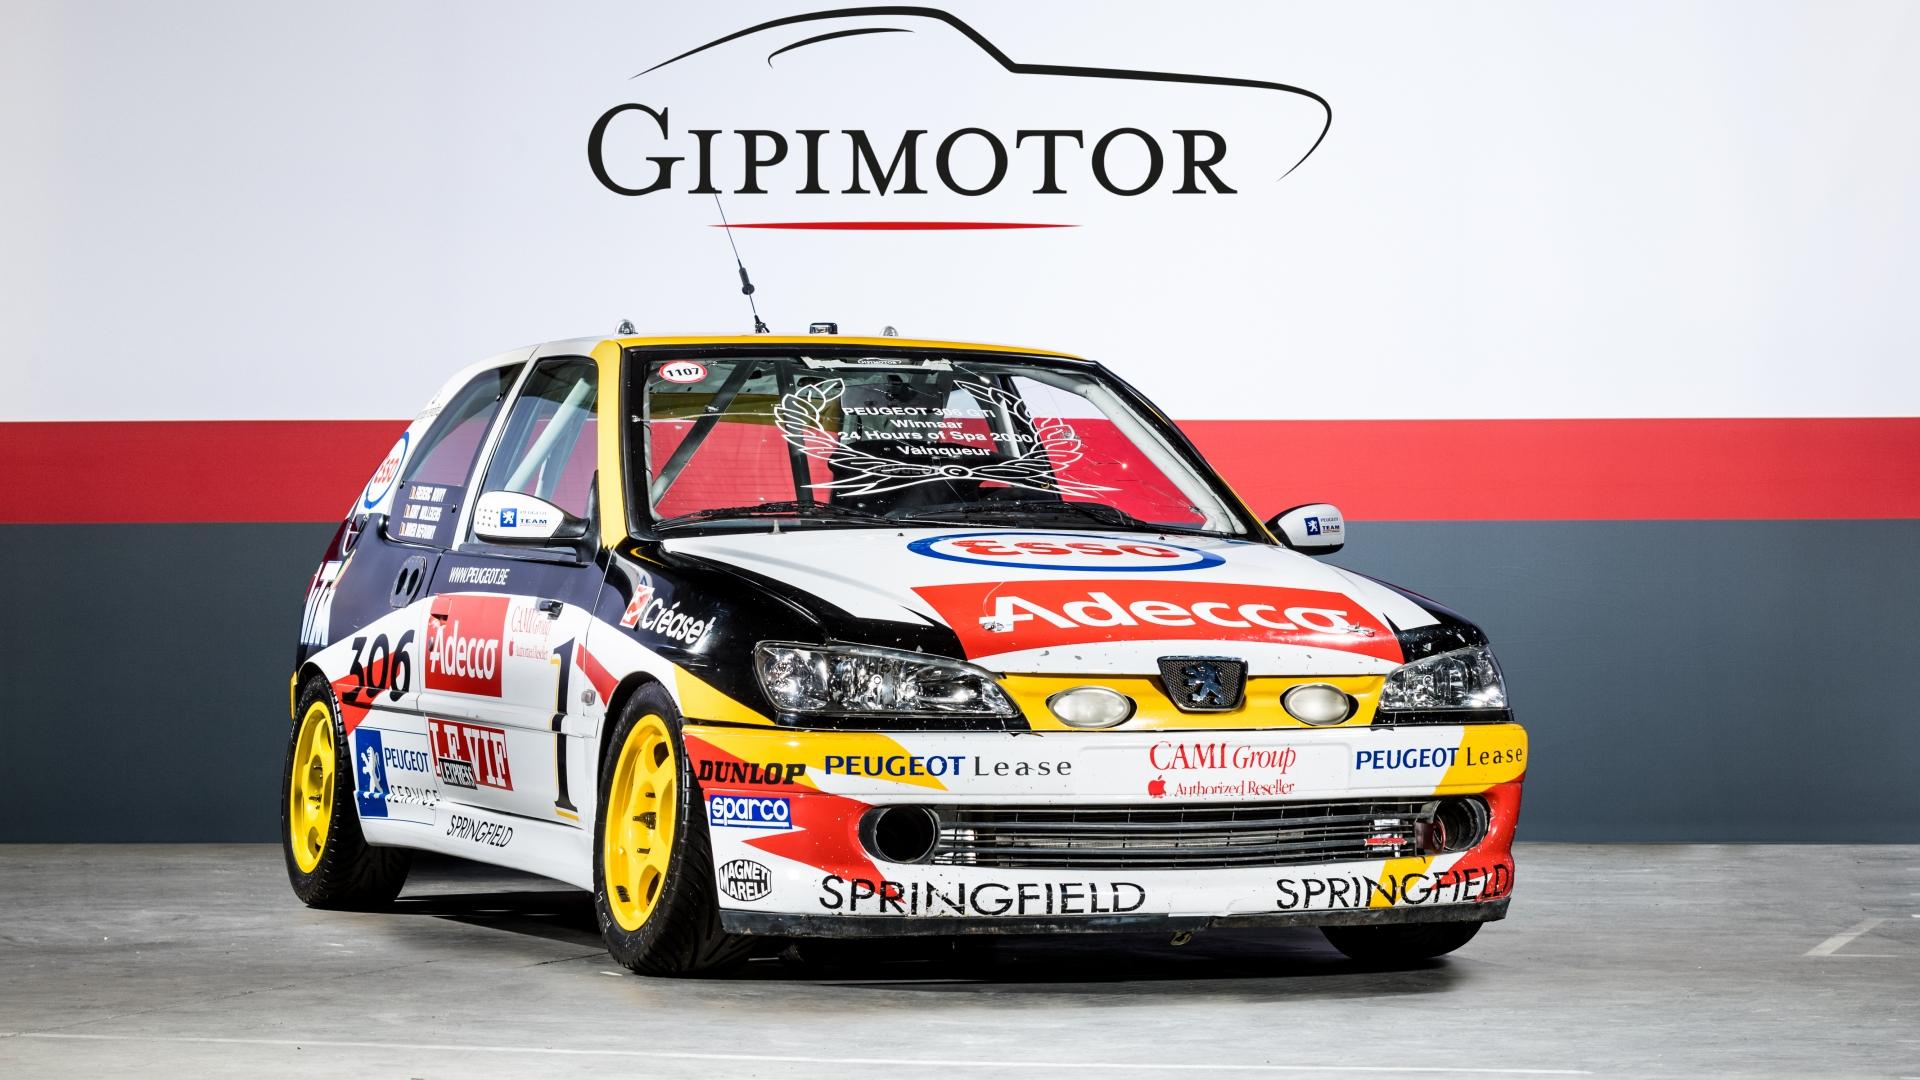 Peugeot - Peugeot 306 Pro Car · Gipimotor